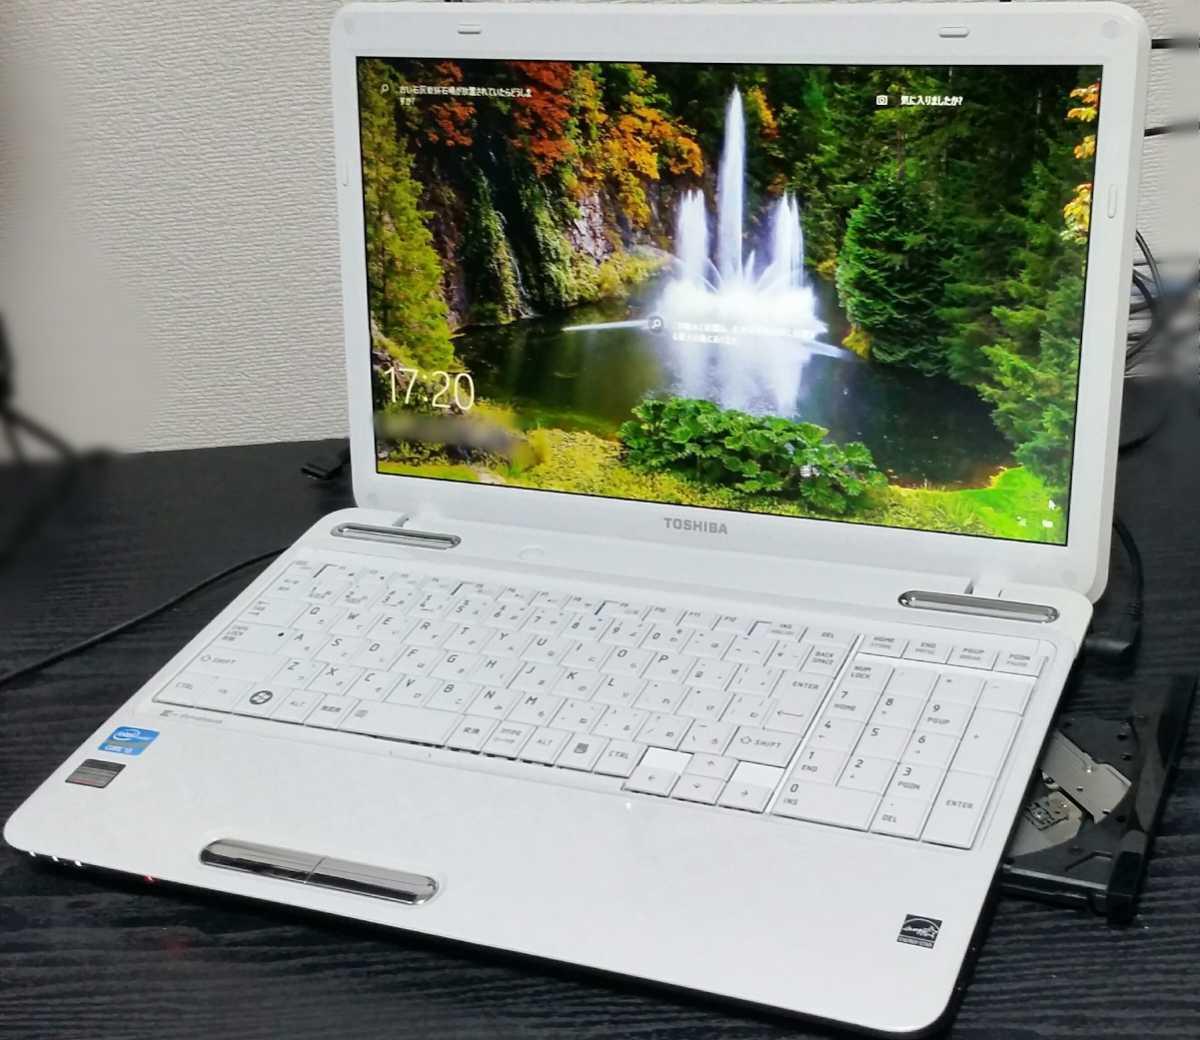 n28 コスパ◎起動約10秒(^o^)爆速【Core i3 メモリ8GB SSD新品480GB】dynabook Win1O Office HDMI【即決新品バッテリー Blu-ray他特典♪】